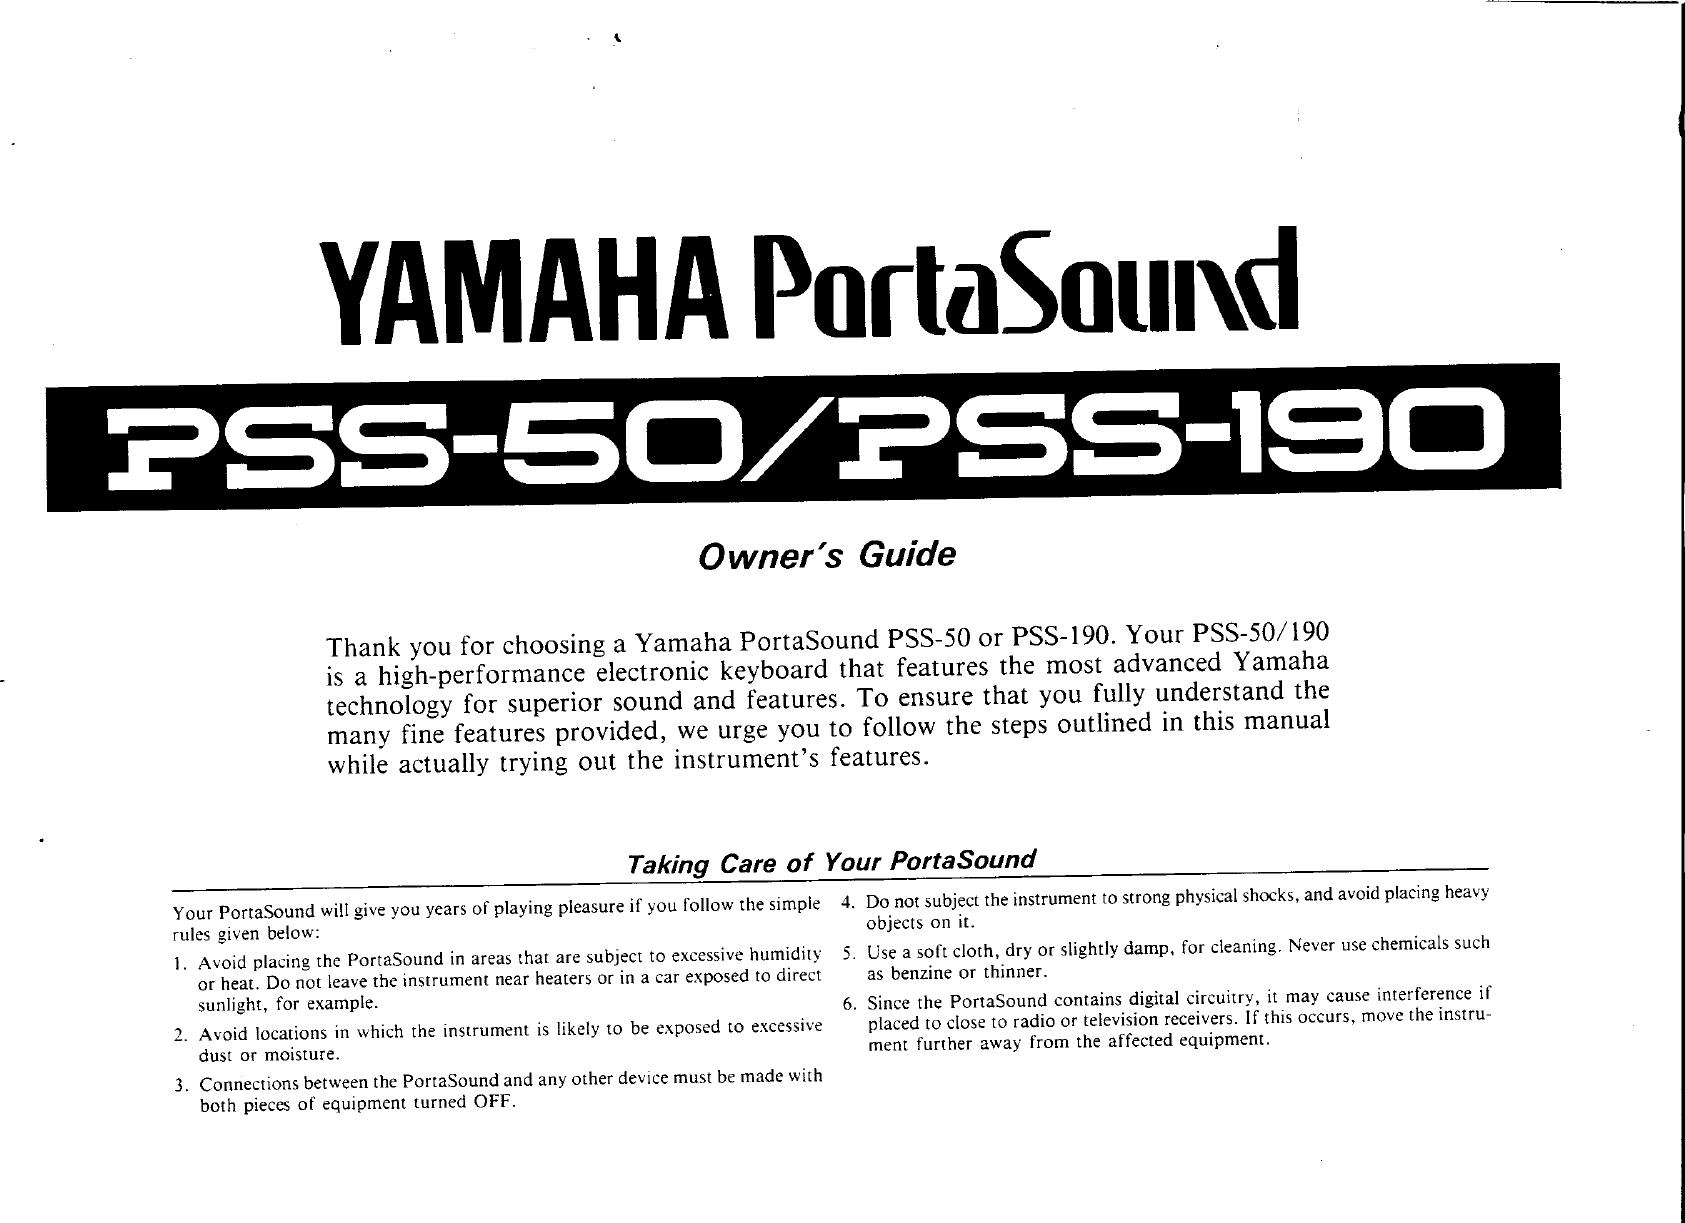 Yamaha PSS 50/PSS 190 Owner's Manual (Image) PSS190E